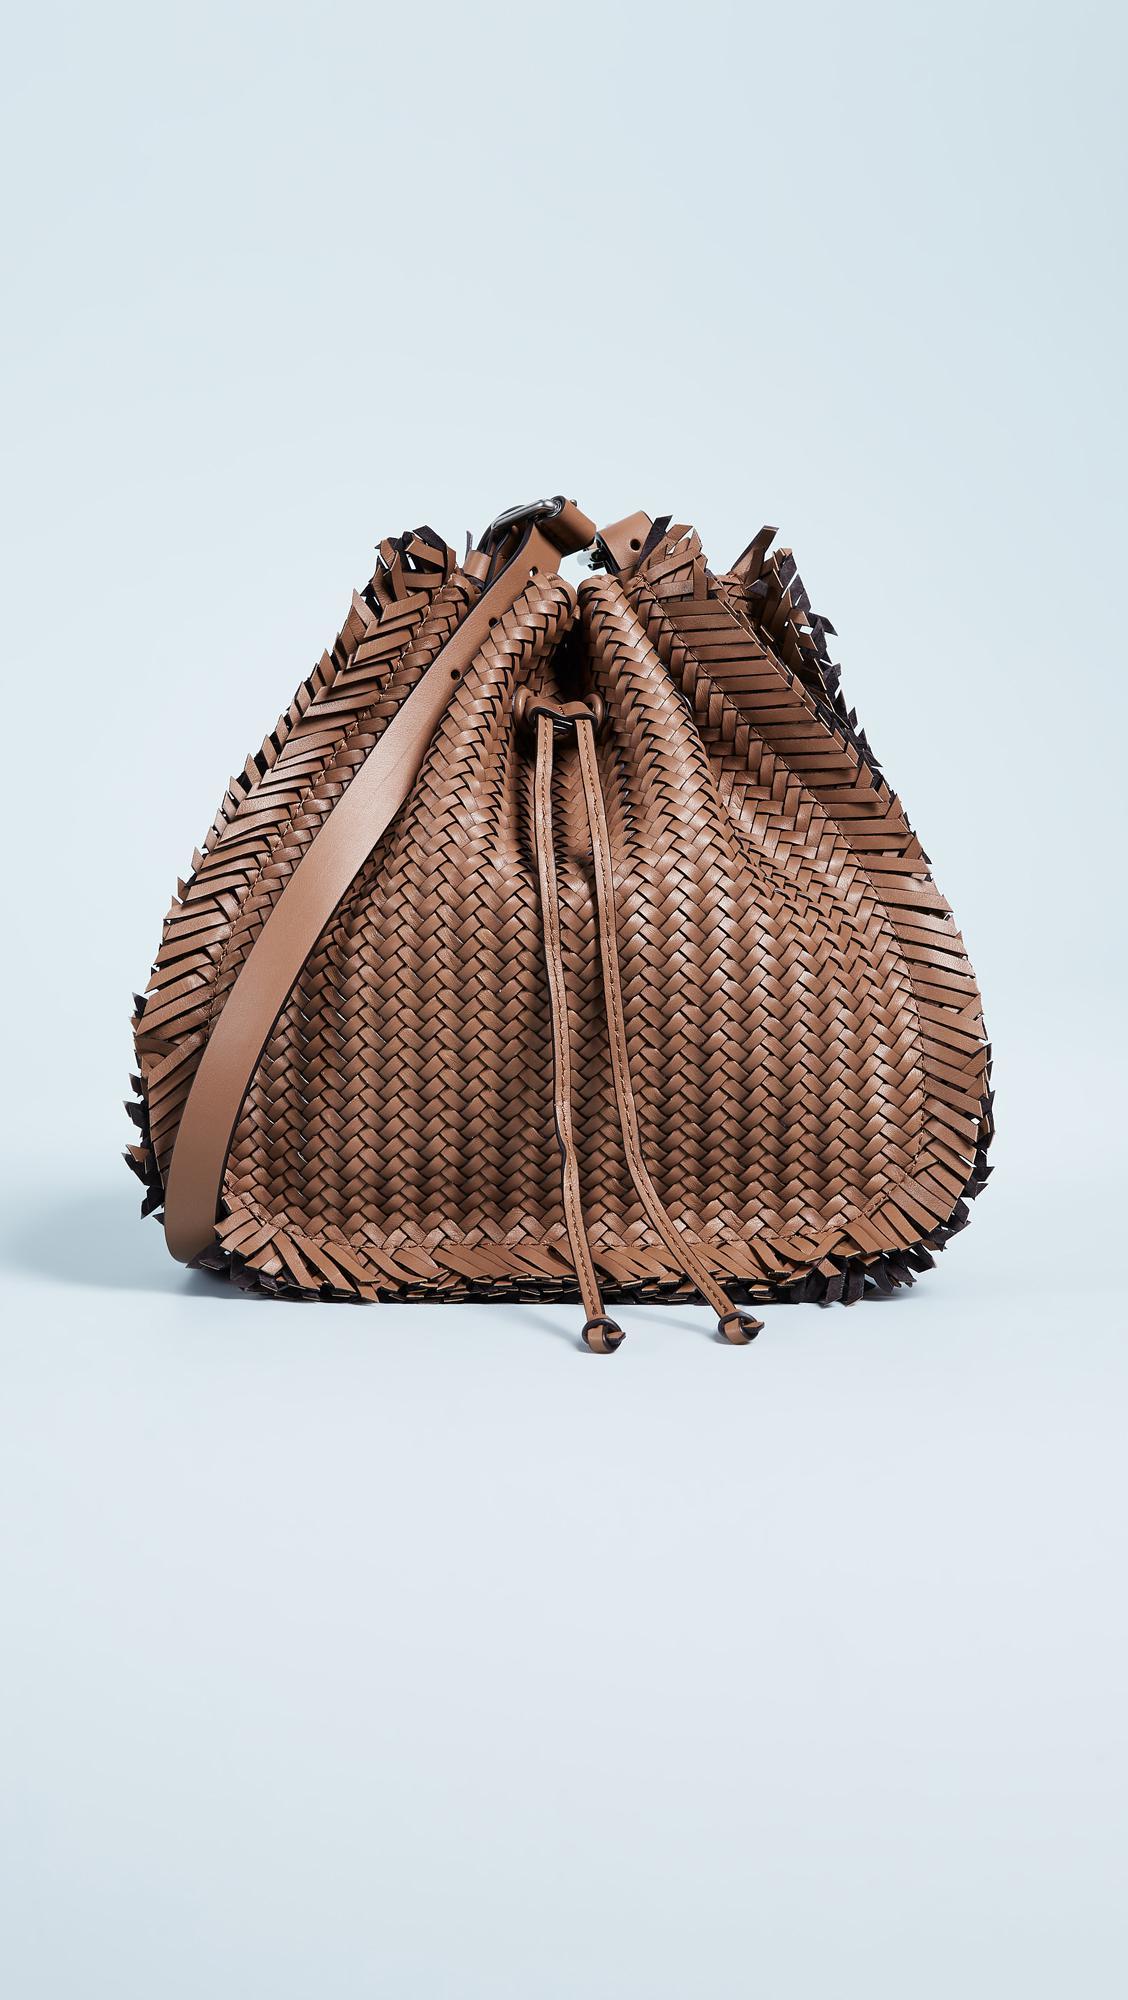 d60cb129d124 Michael Kors Maldives Shoulder Bag With Drawstring - Lyst